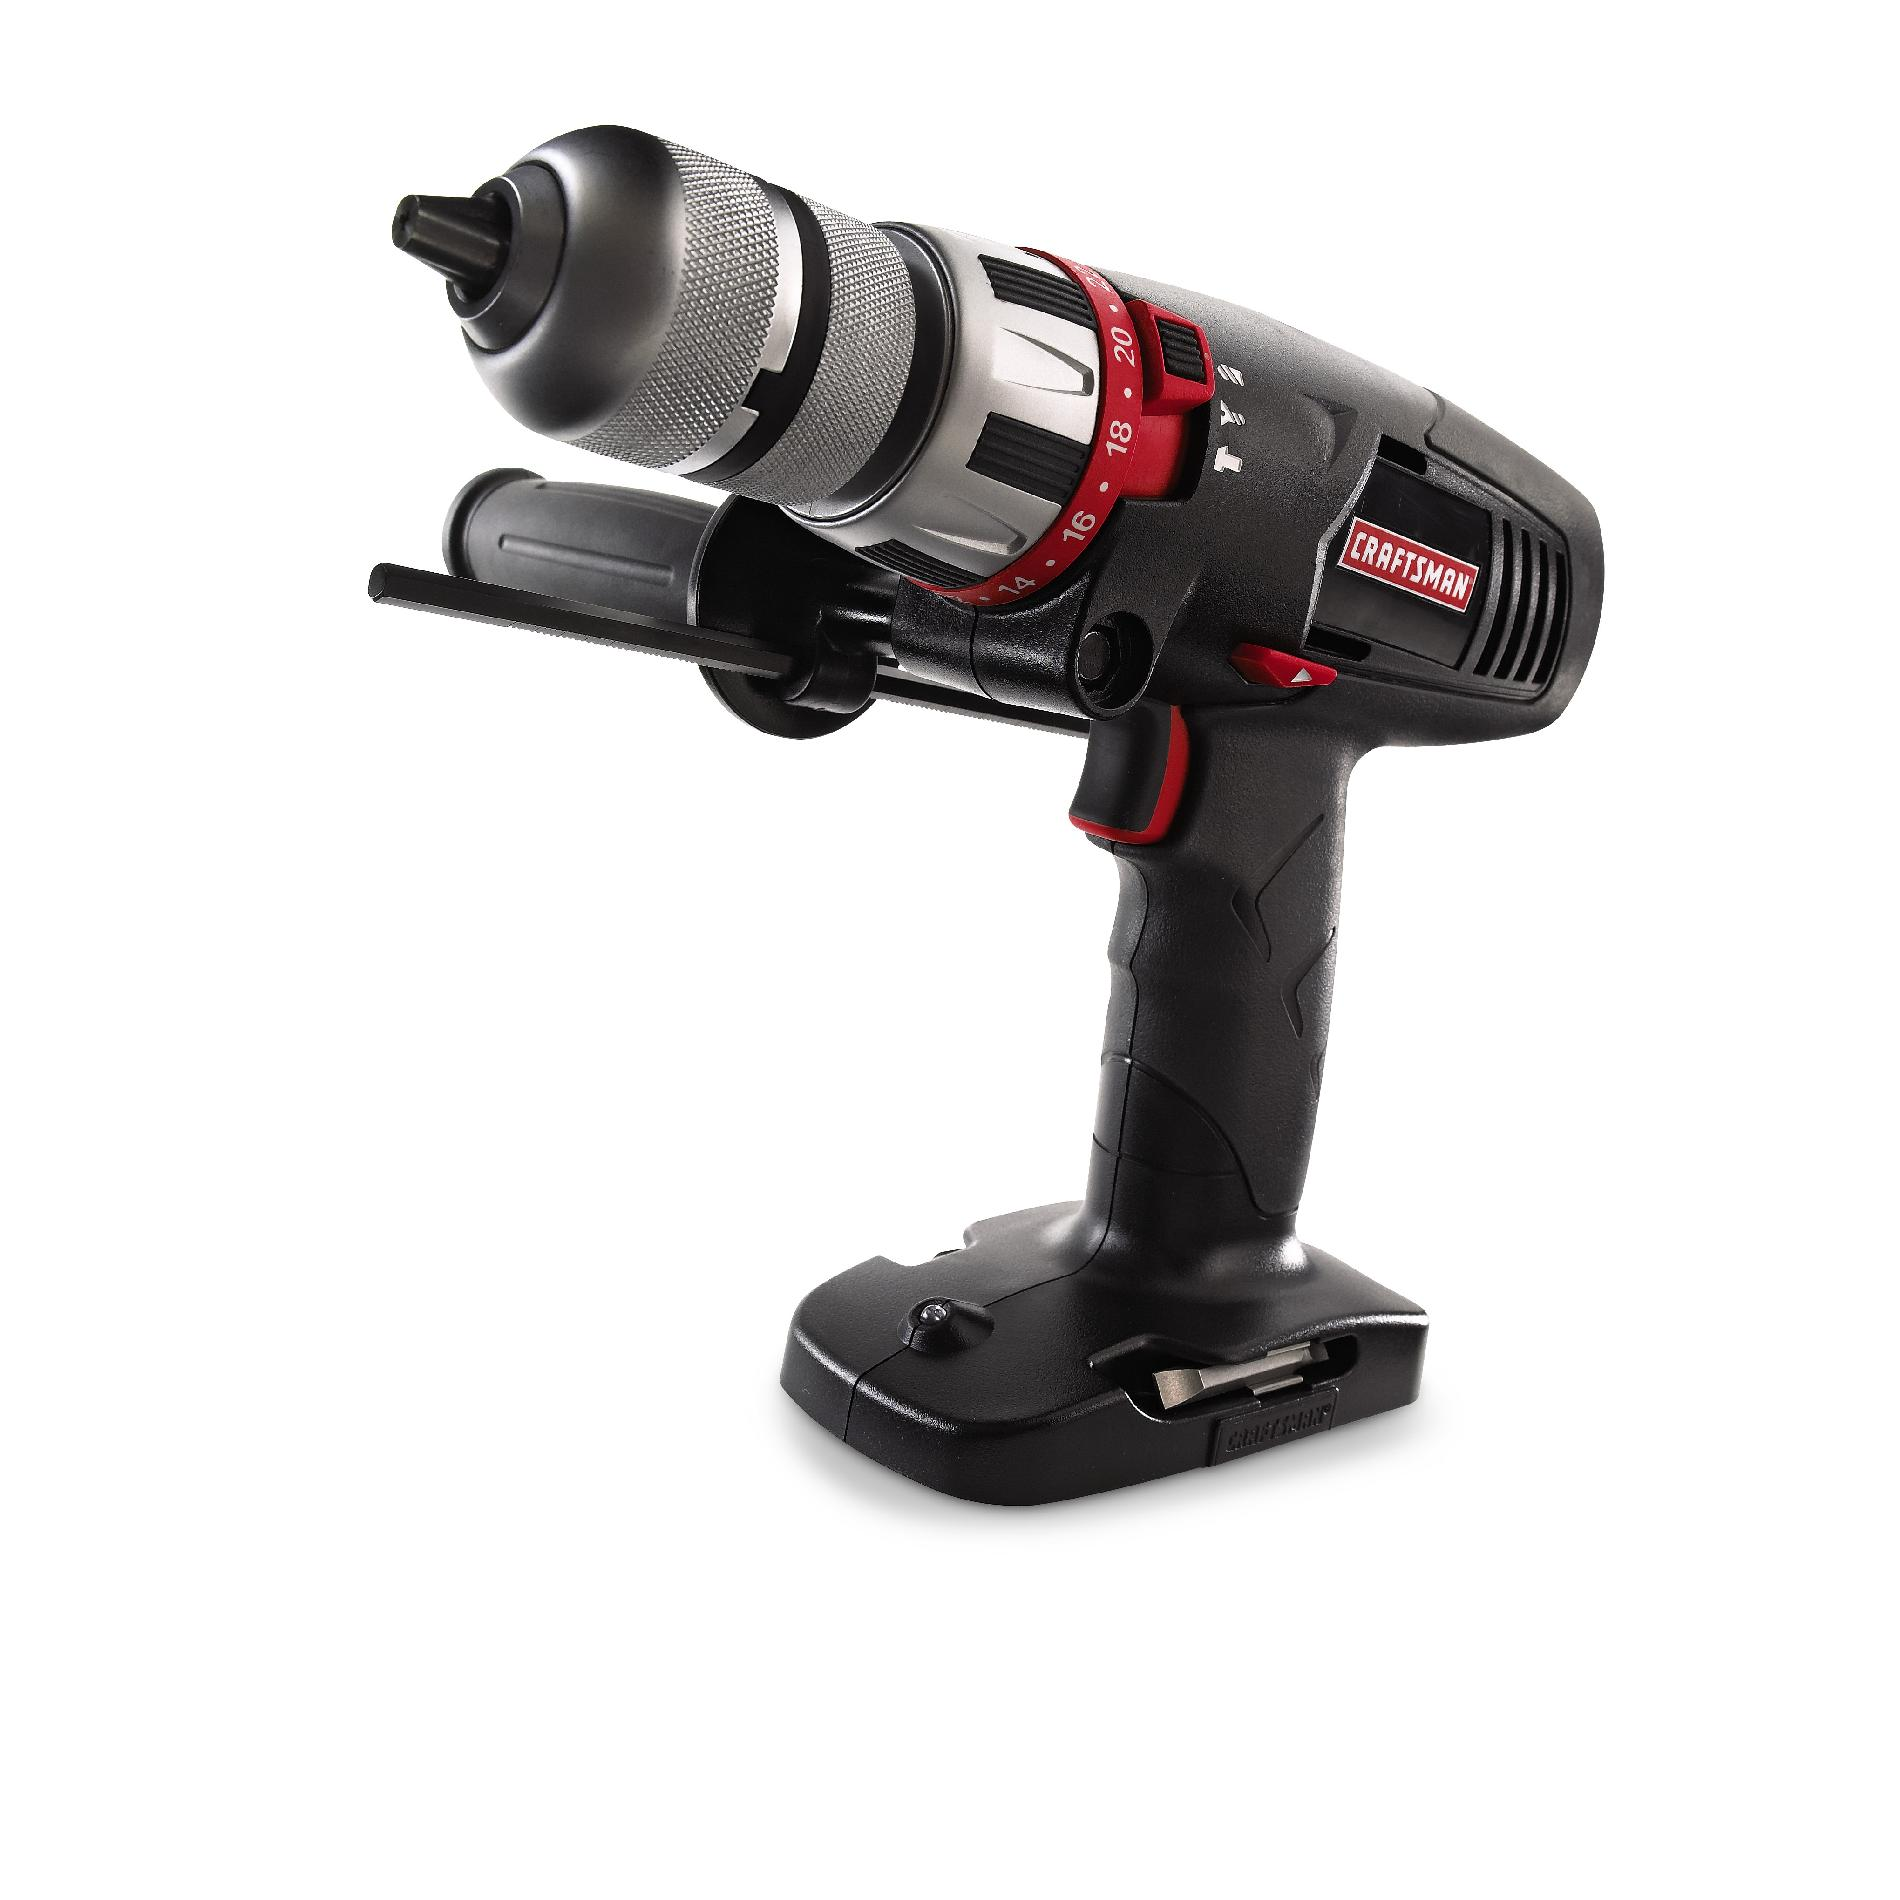 Craftsman 19.2-Volt Cordless 1/2-In. Hammer Drill/Driver